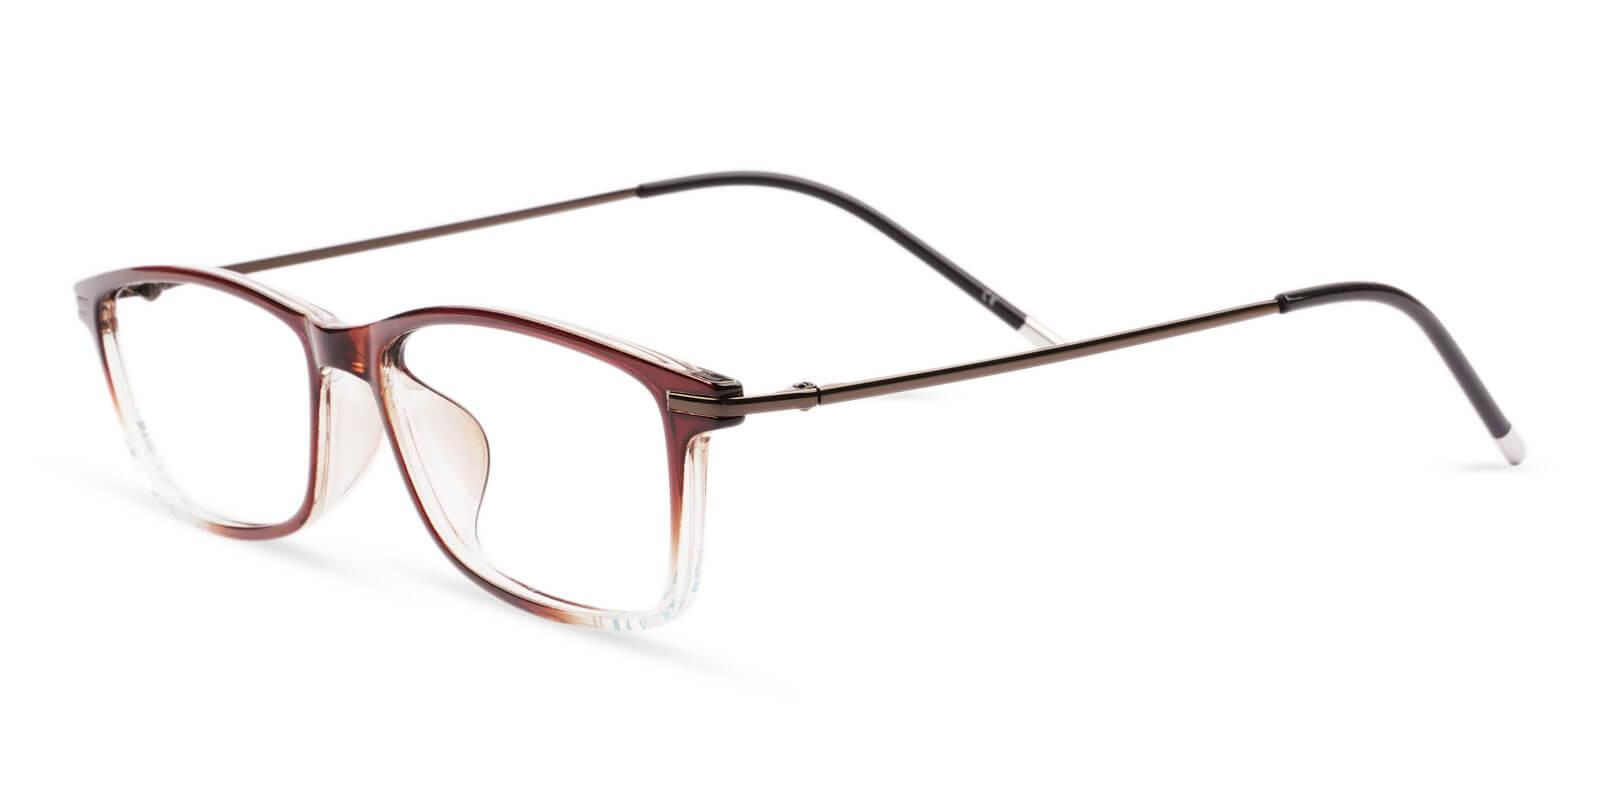 Radcliffe Brown TR Lightweight , UniversalBridgeFit , Eyeglasses Frames from ABBE Glasses